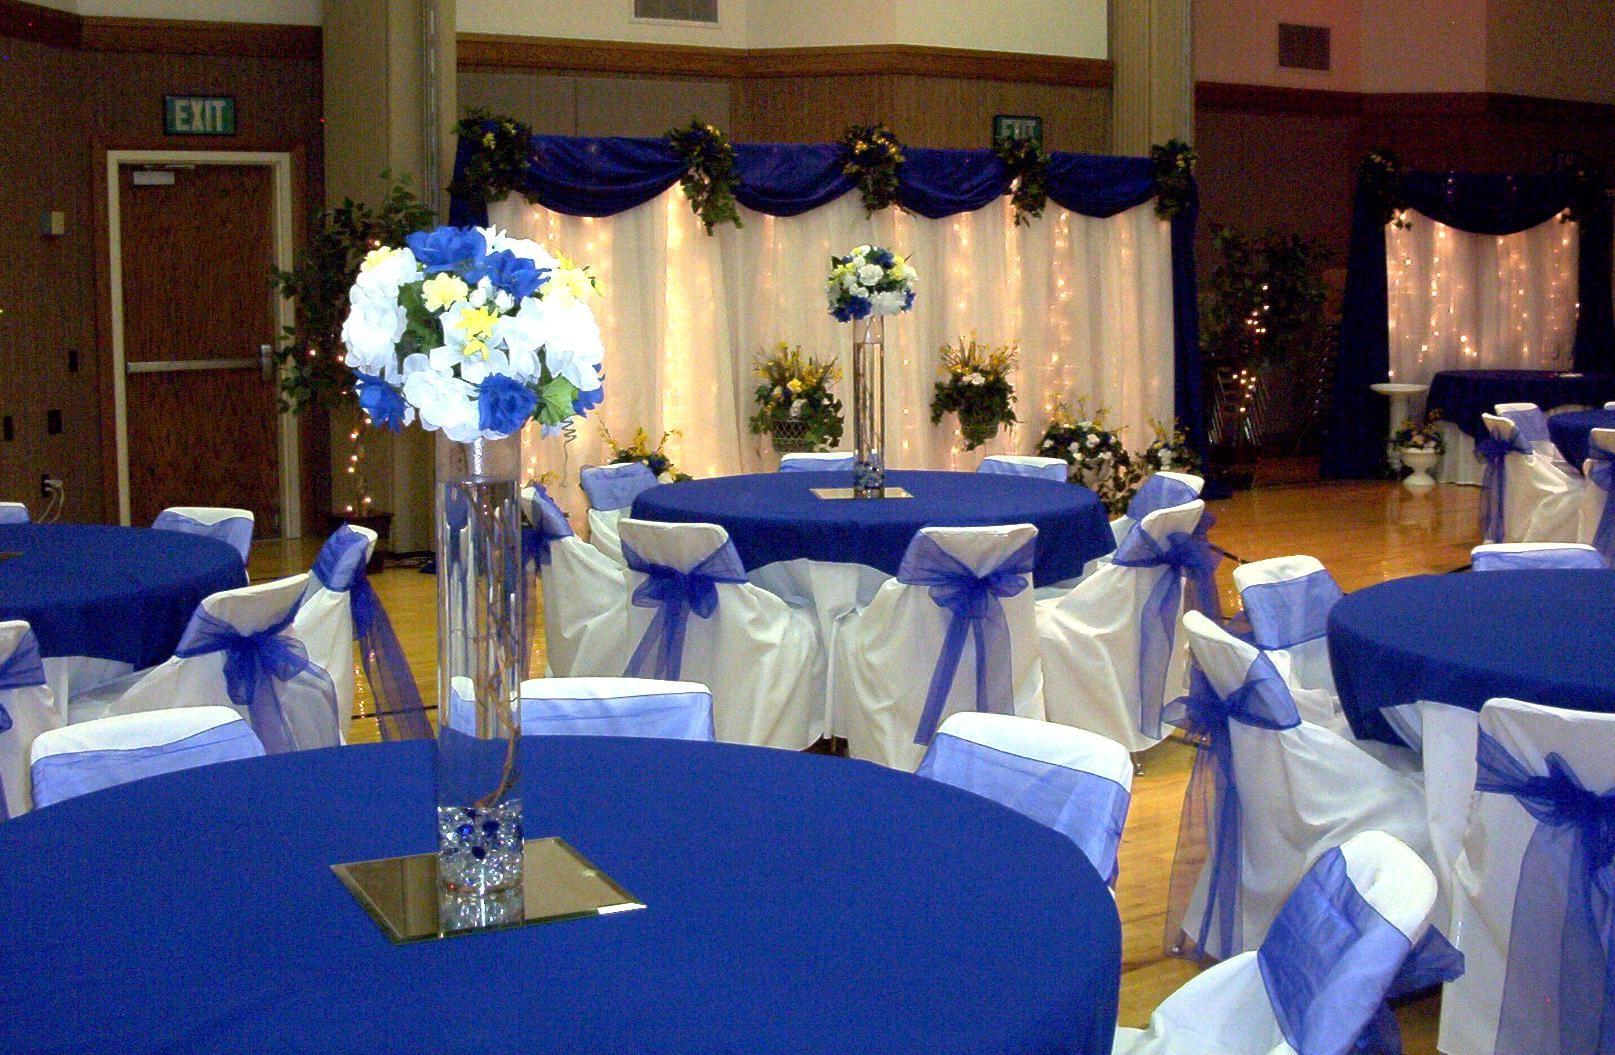 royal blue and silver wedding centerpieces%0A Royal Blue Wedding Decorations Theme and Ideas Royal blue wedding  decorations is u